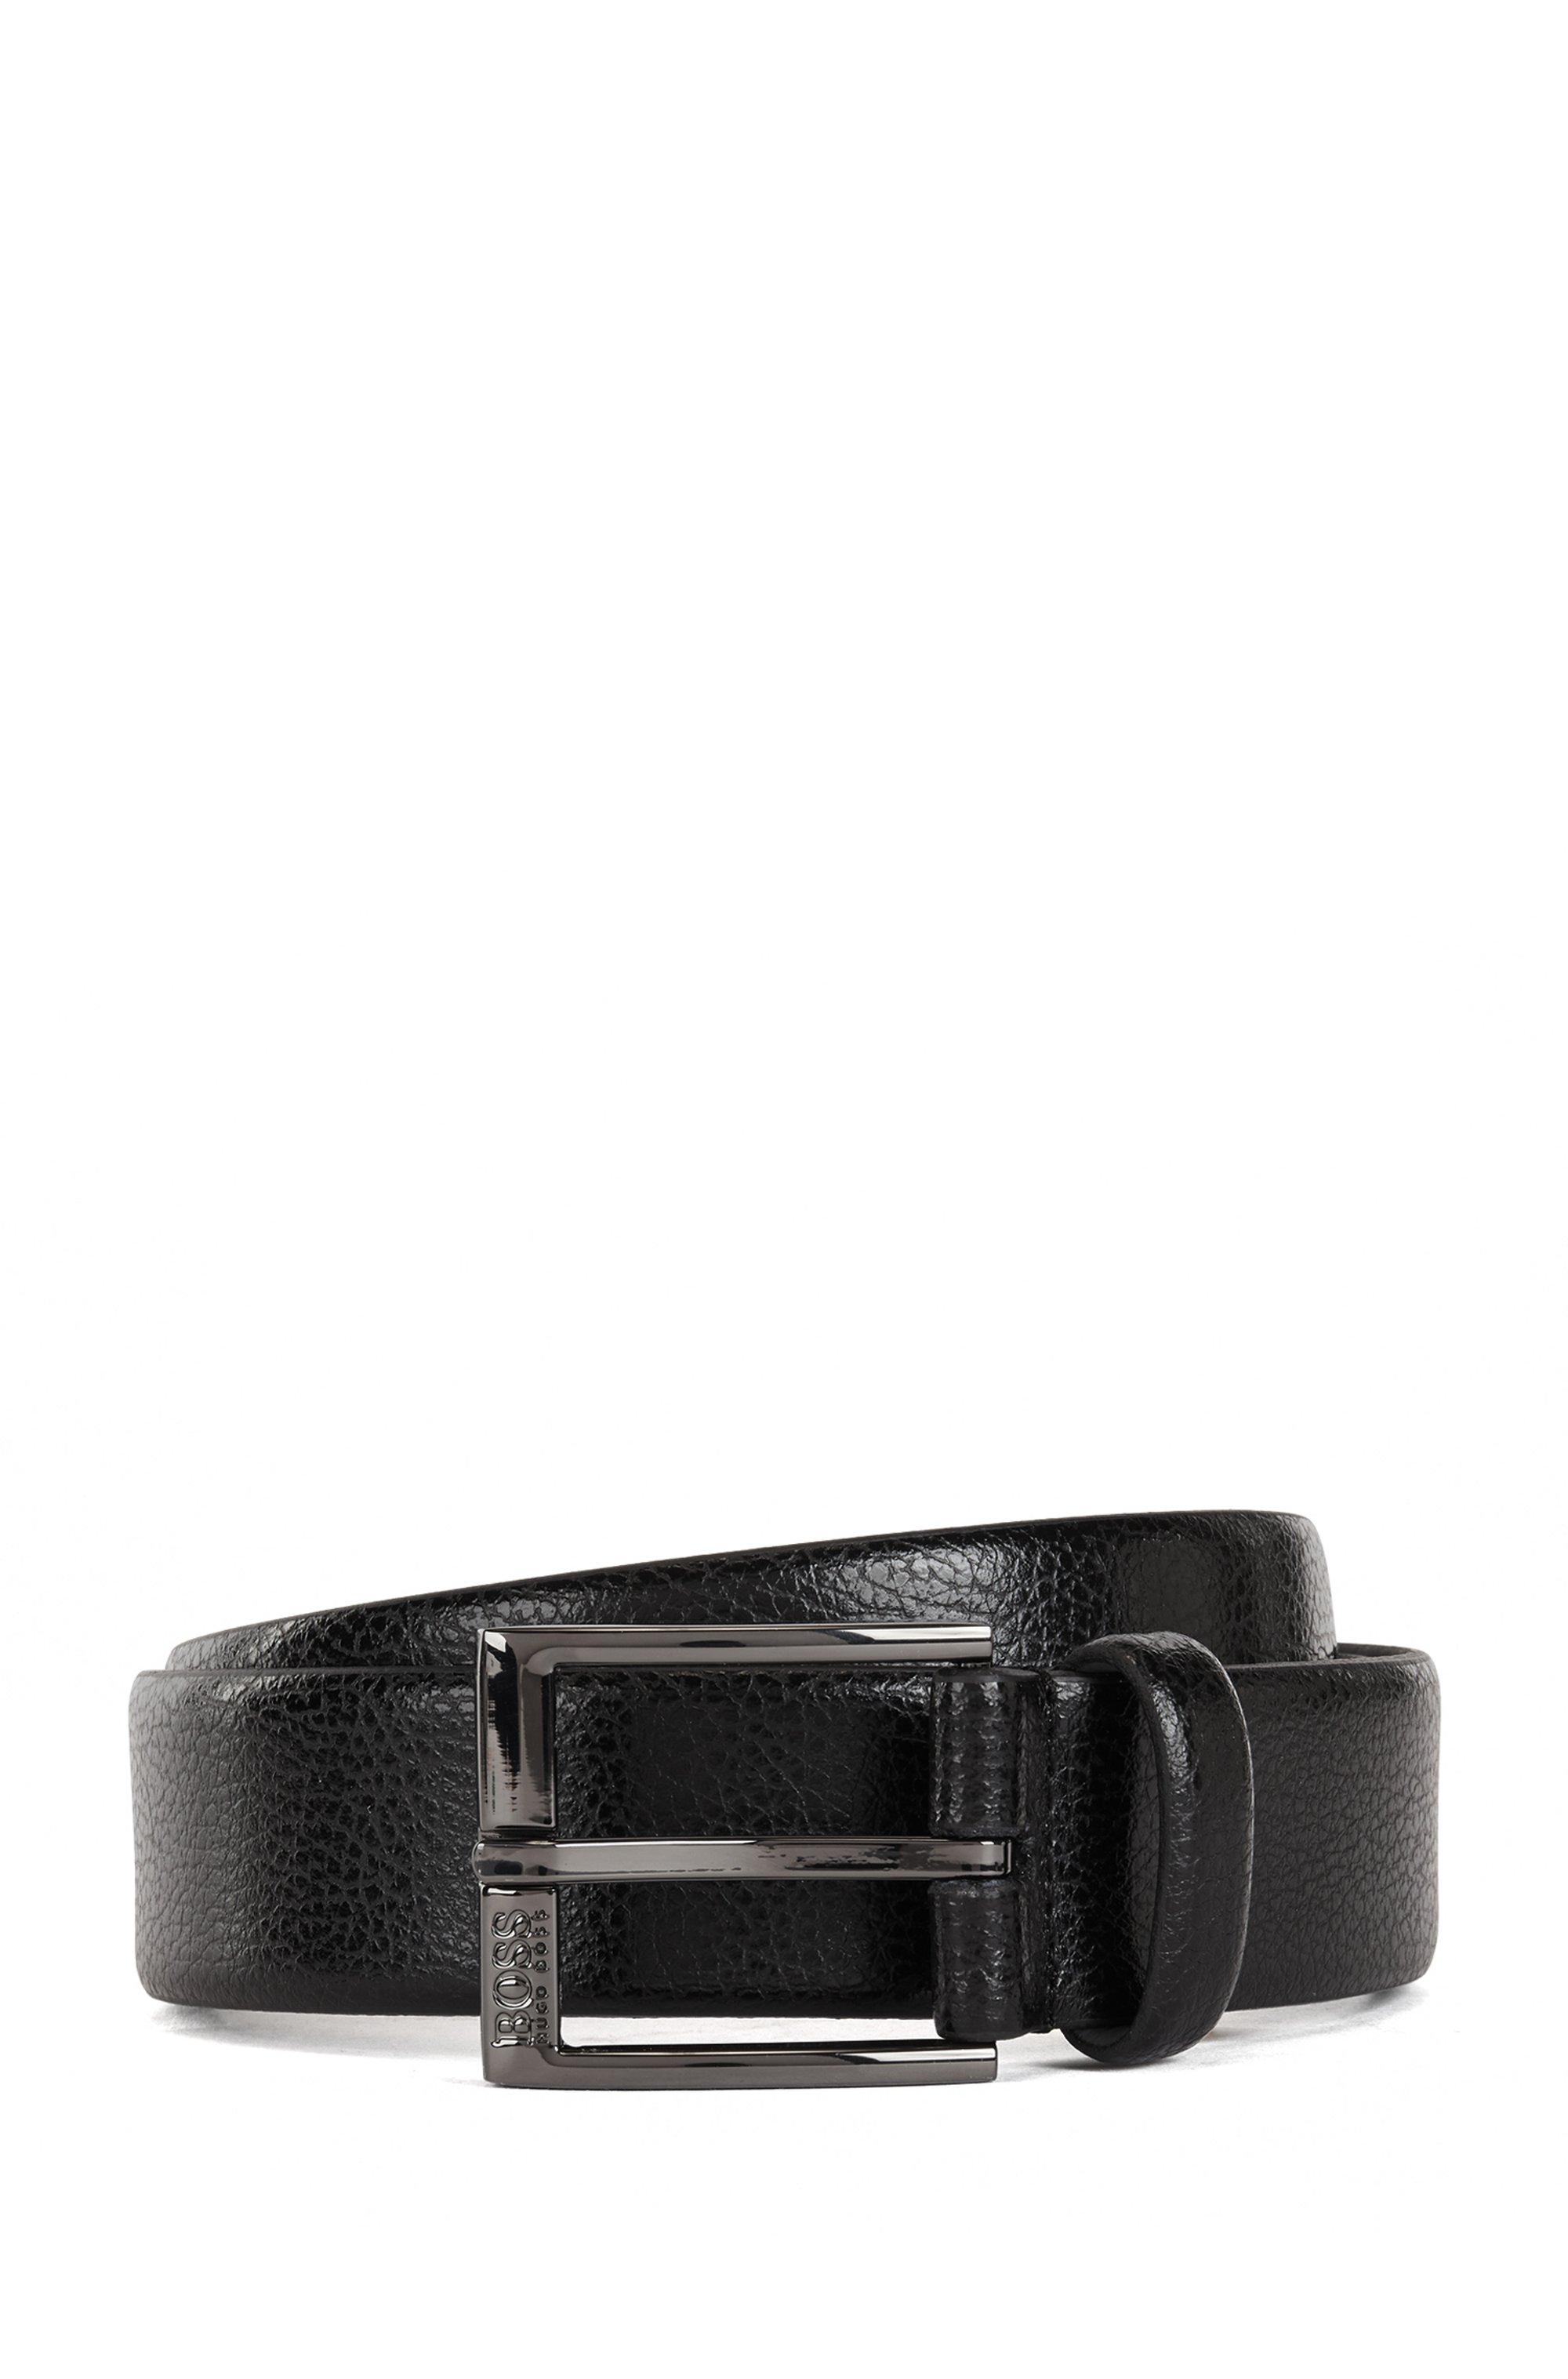 Pin-buckle belt in embossed Italian leather, Black